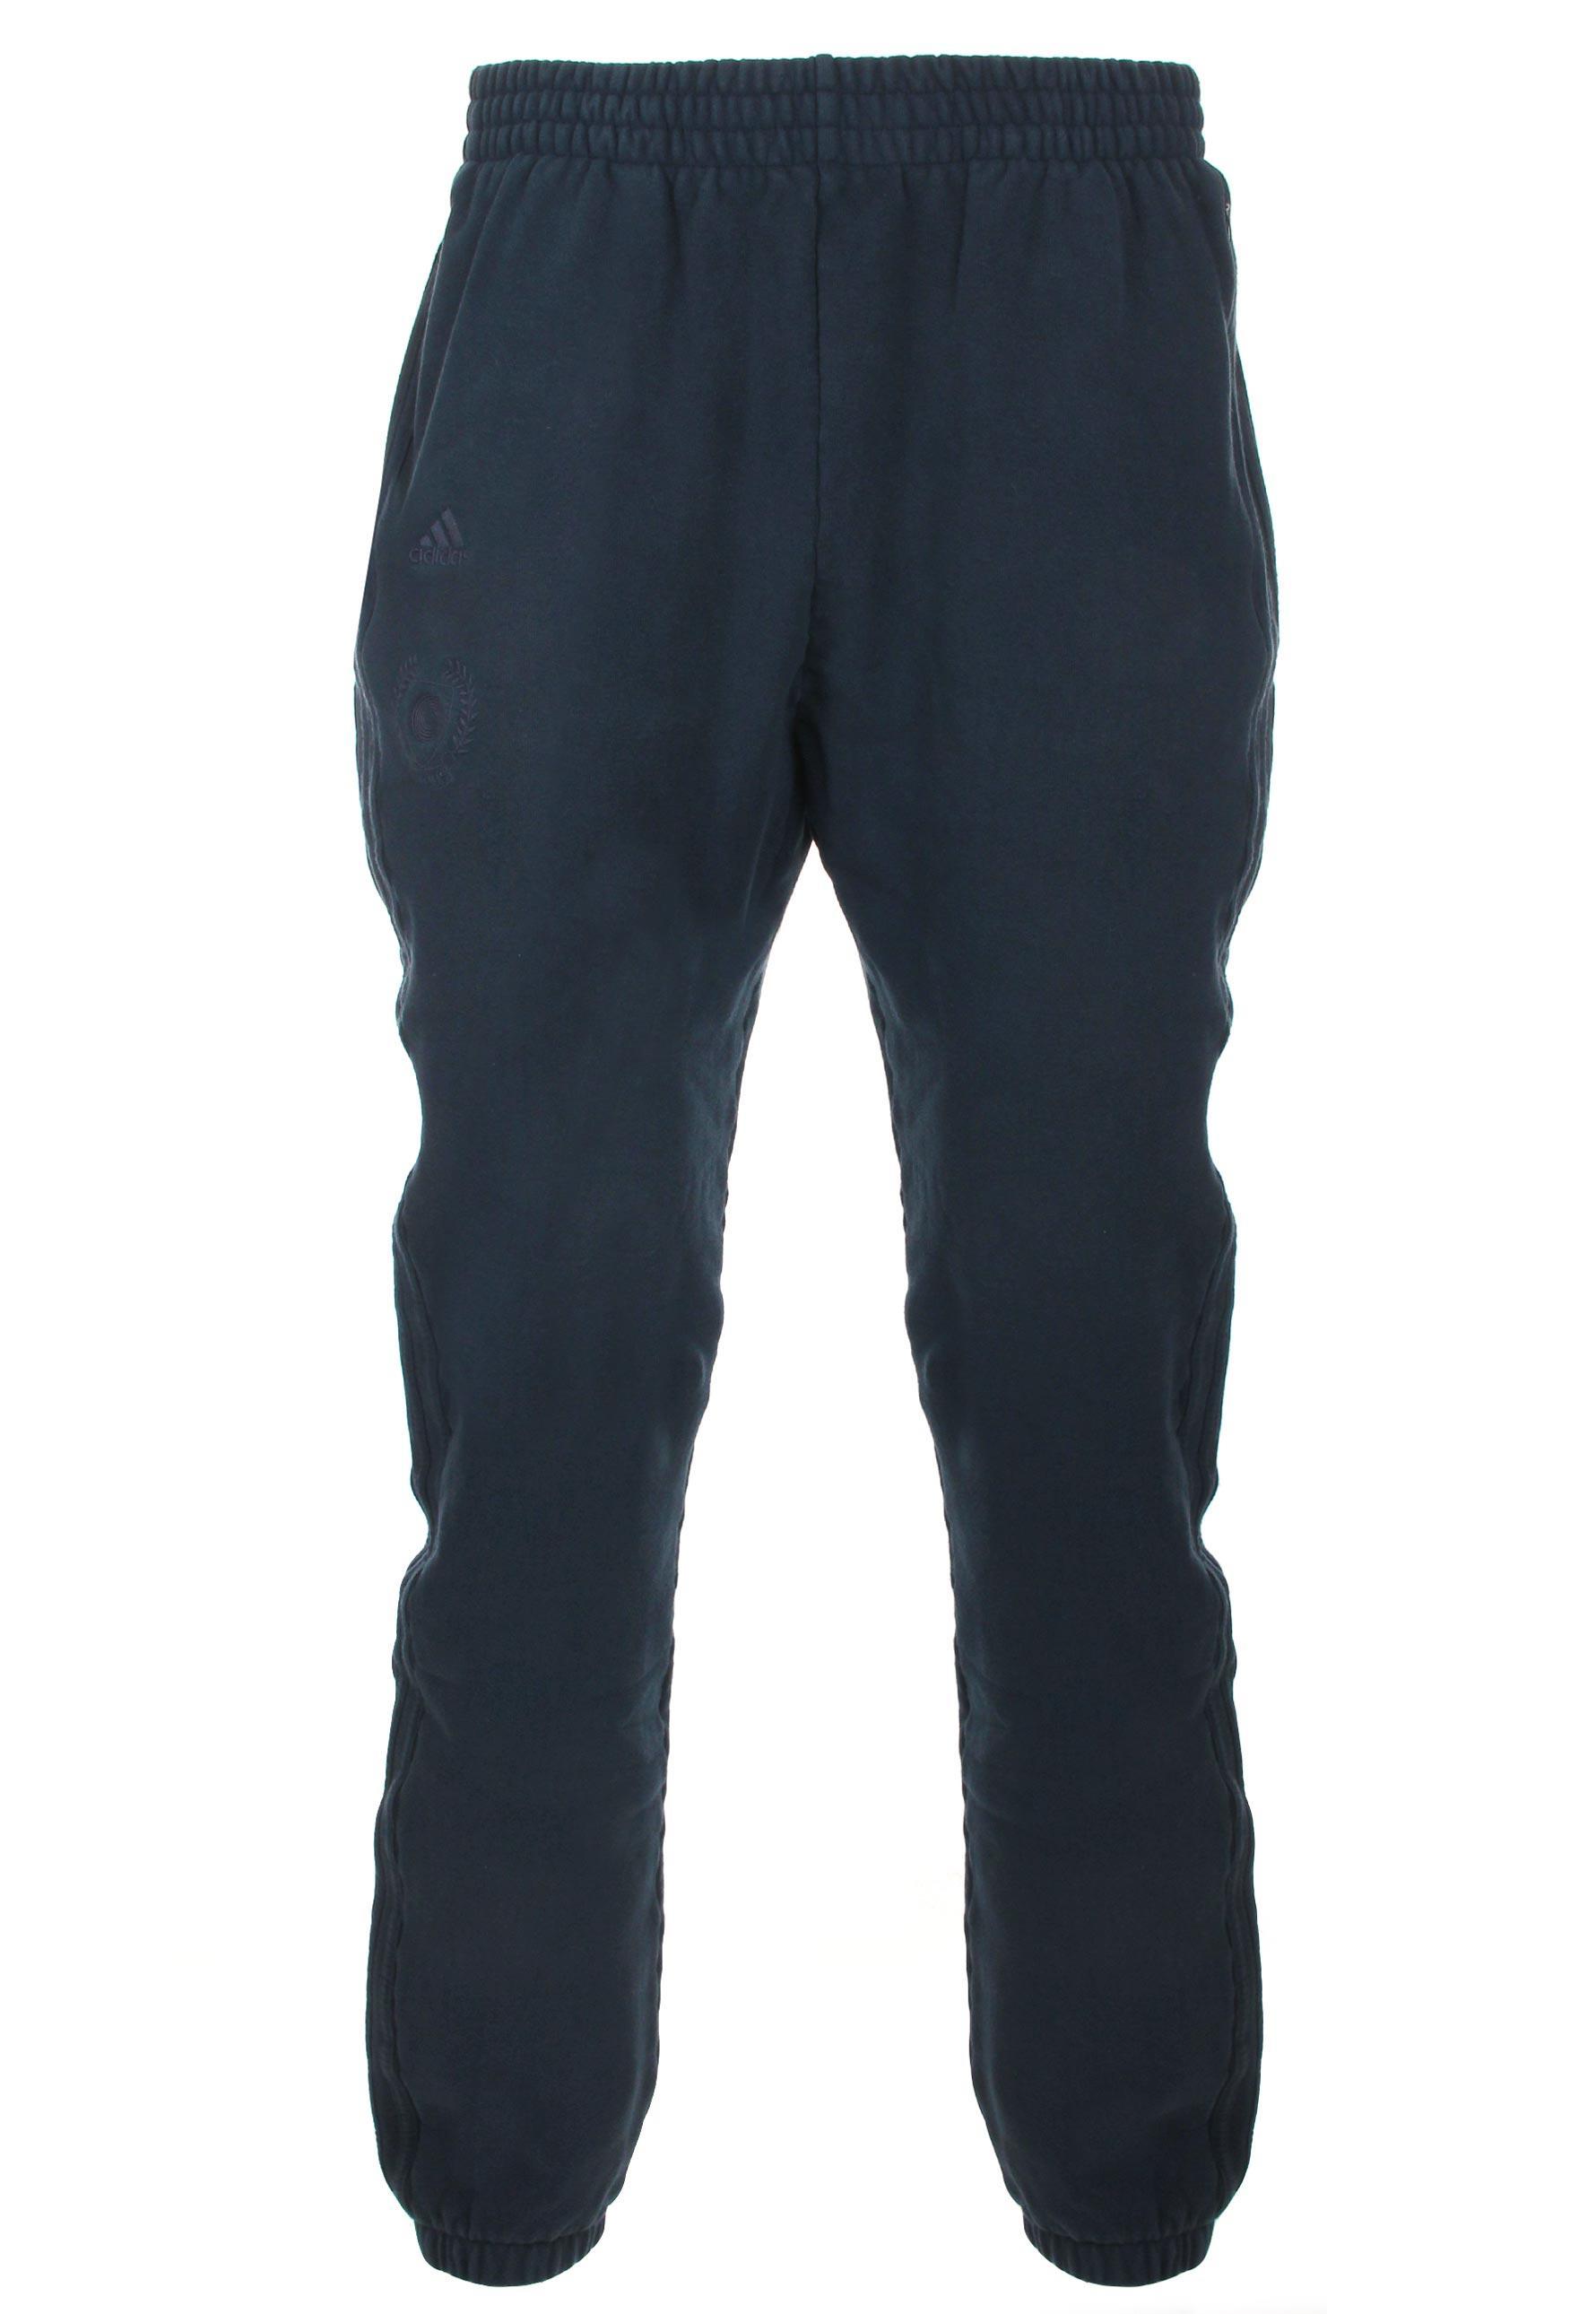 Yeezy Season 5 Calabasas Track Pants Luna In Blue Lyst